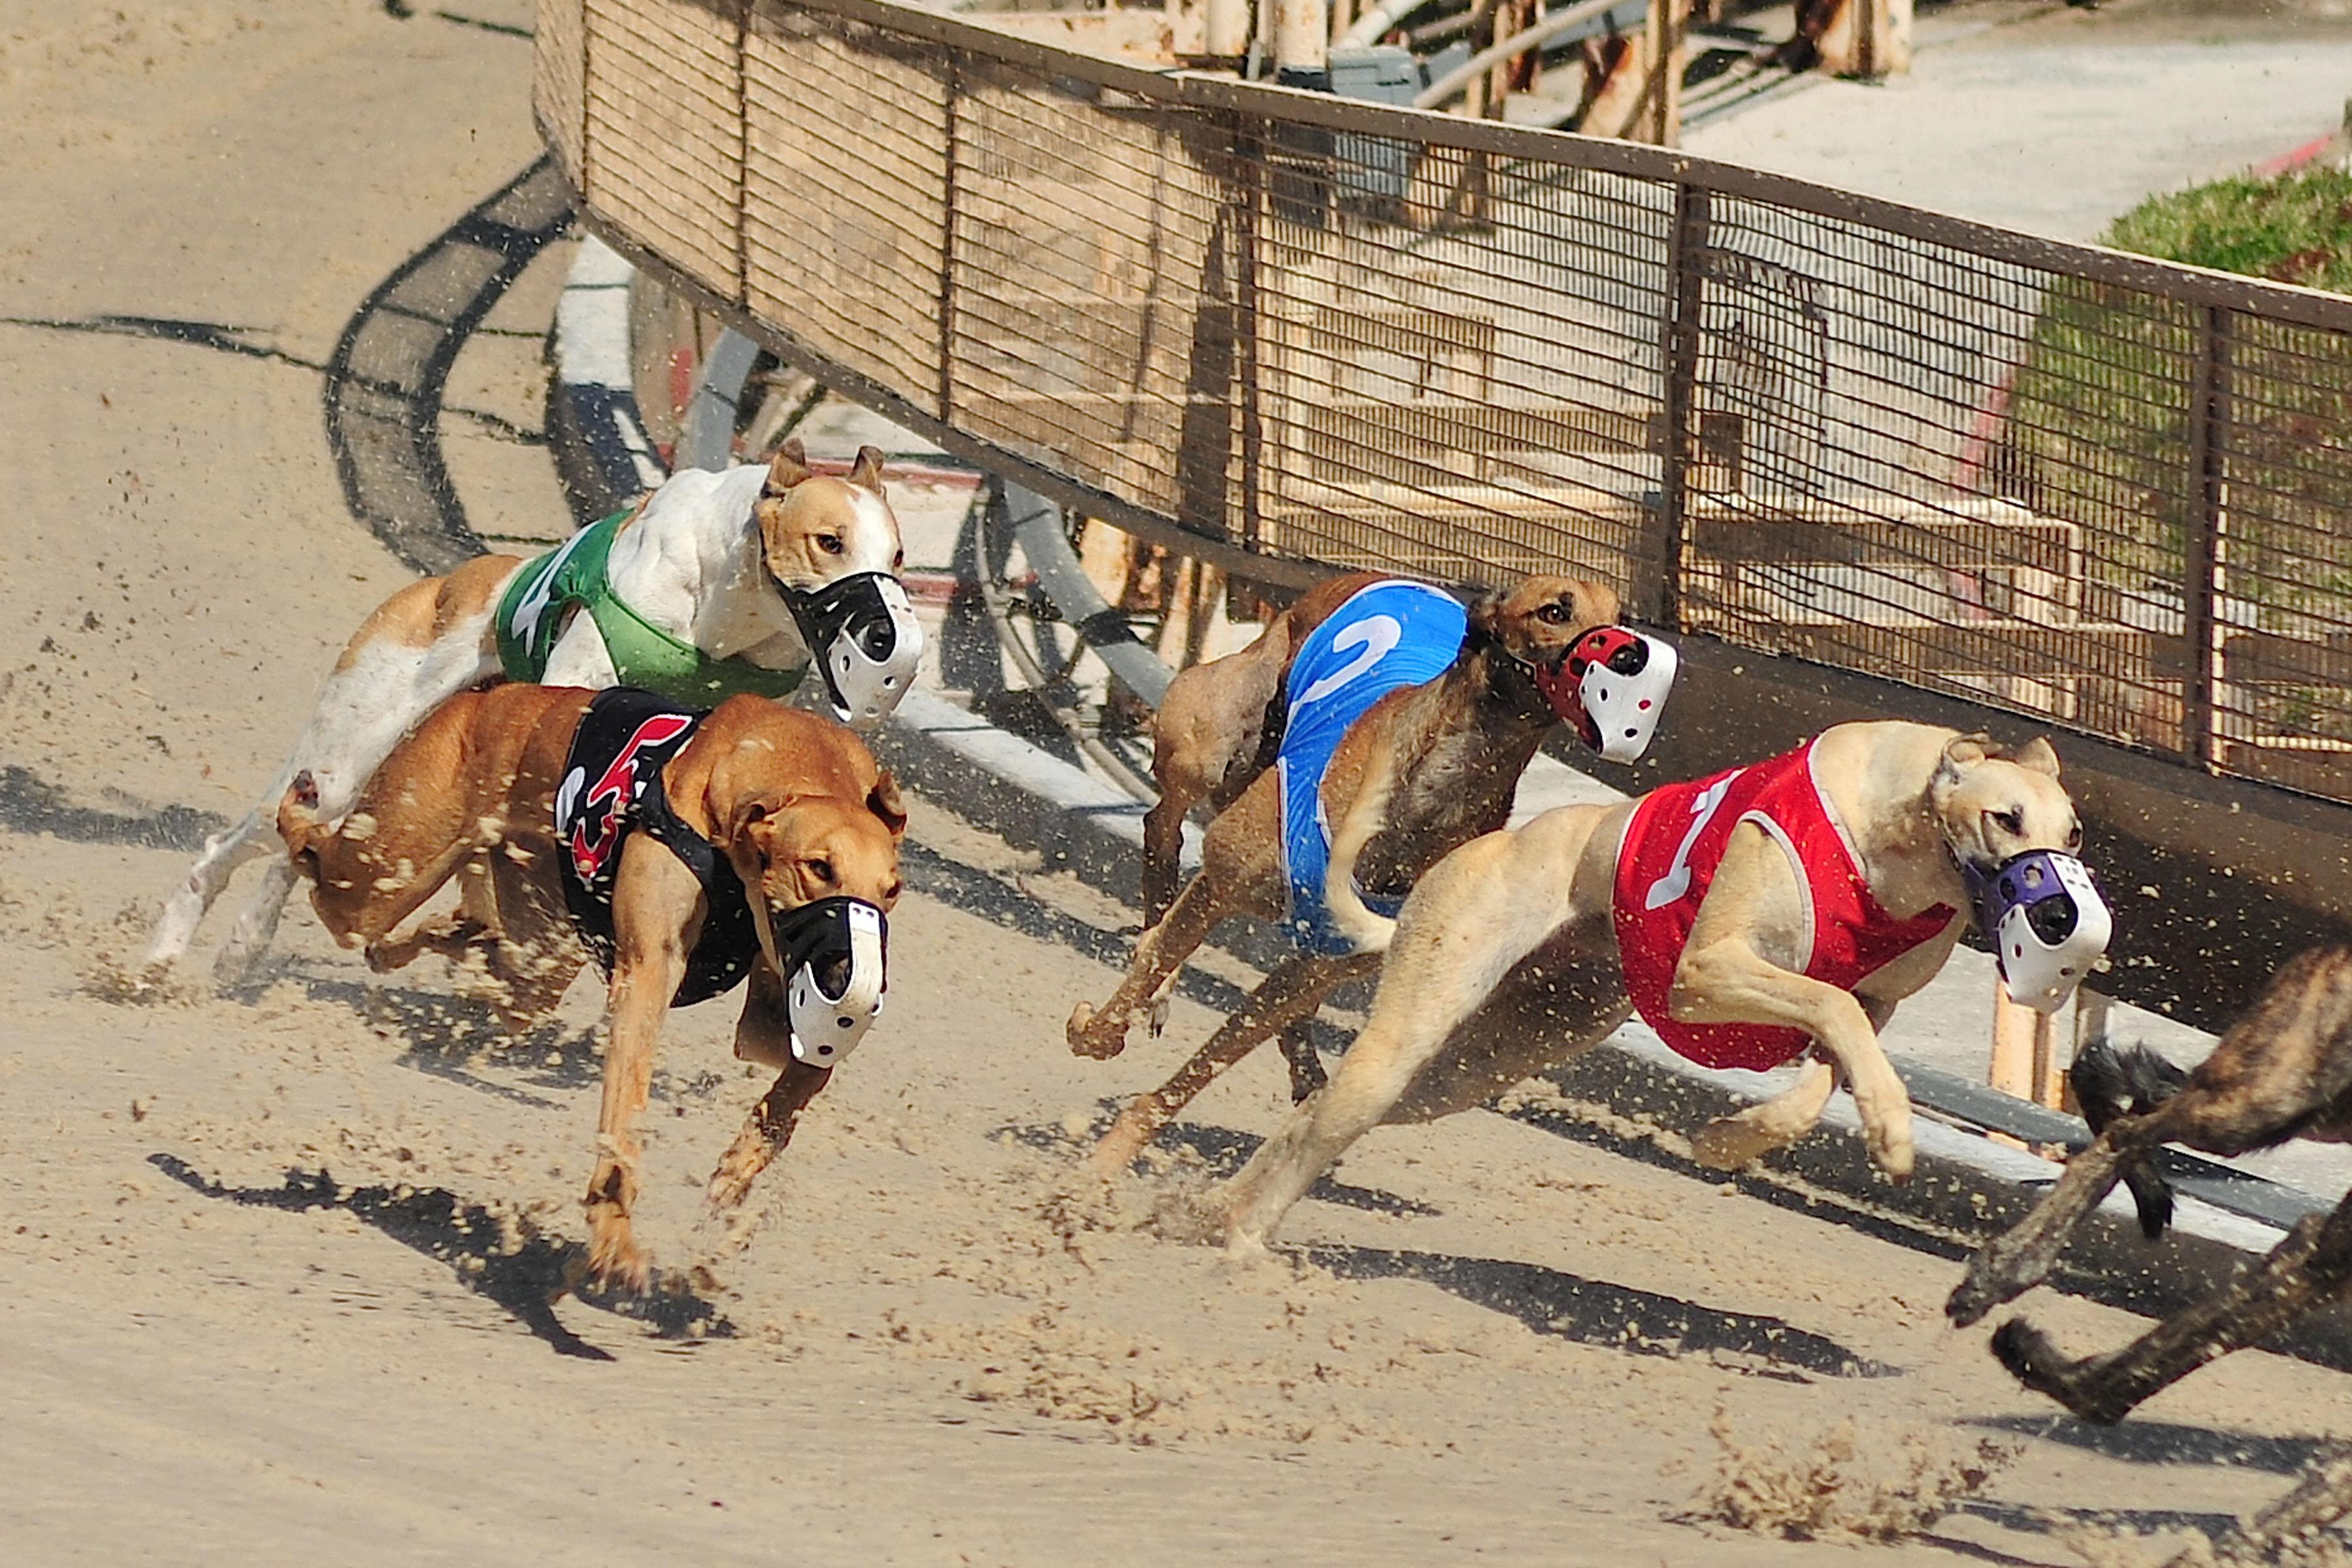 Judge S Ruling Eviscerates State S Greyhound Drug Testing System